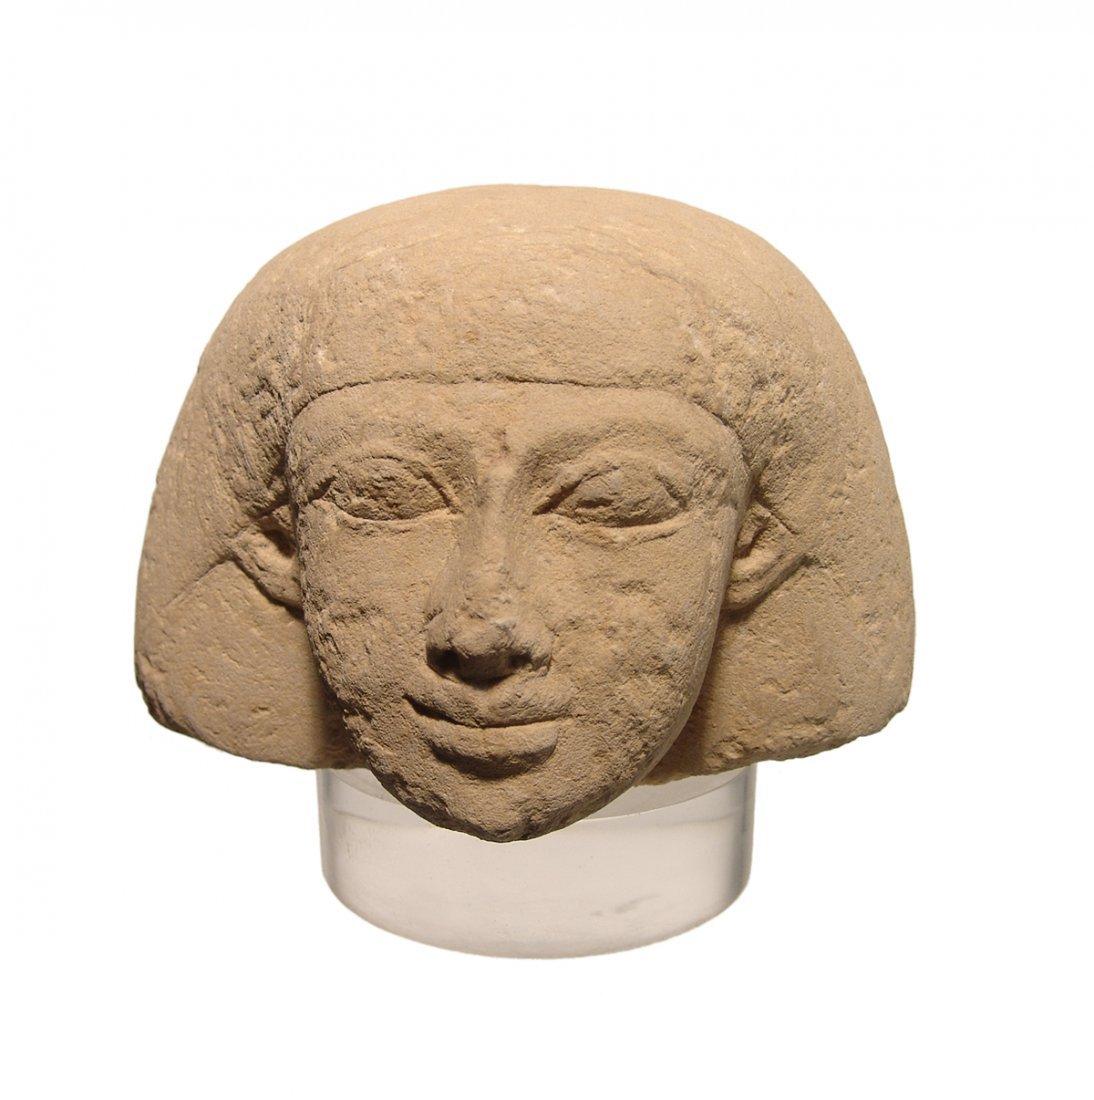 Egyptian sandstone Canopic jar lid representing Imsety